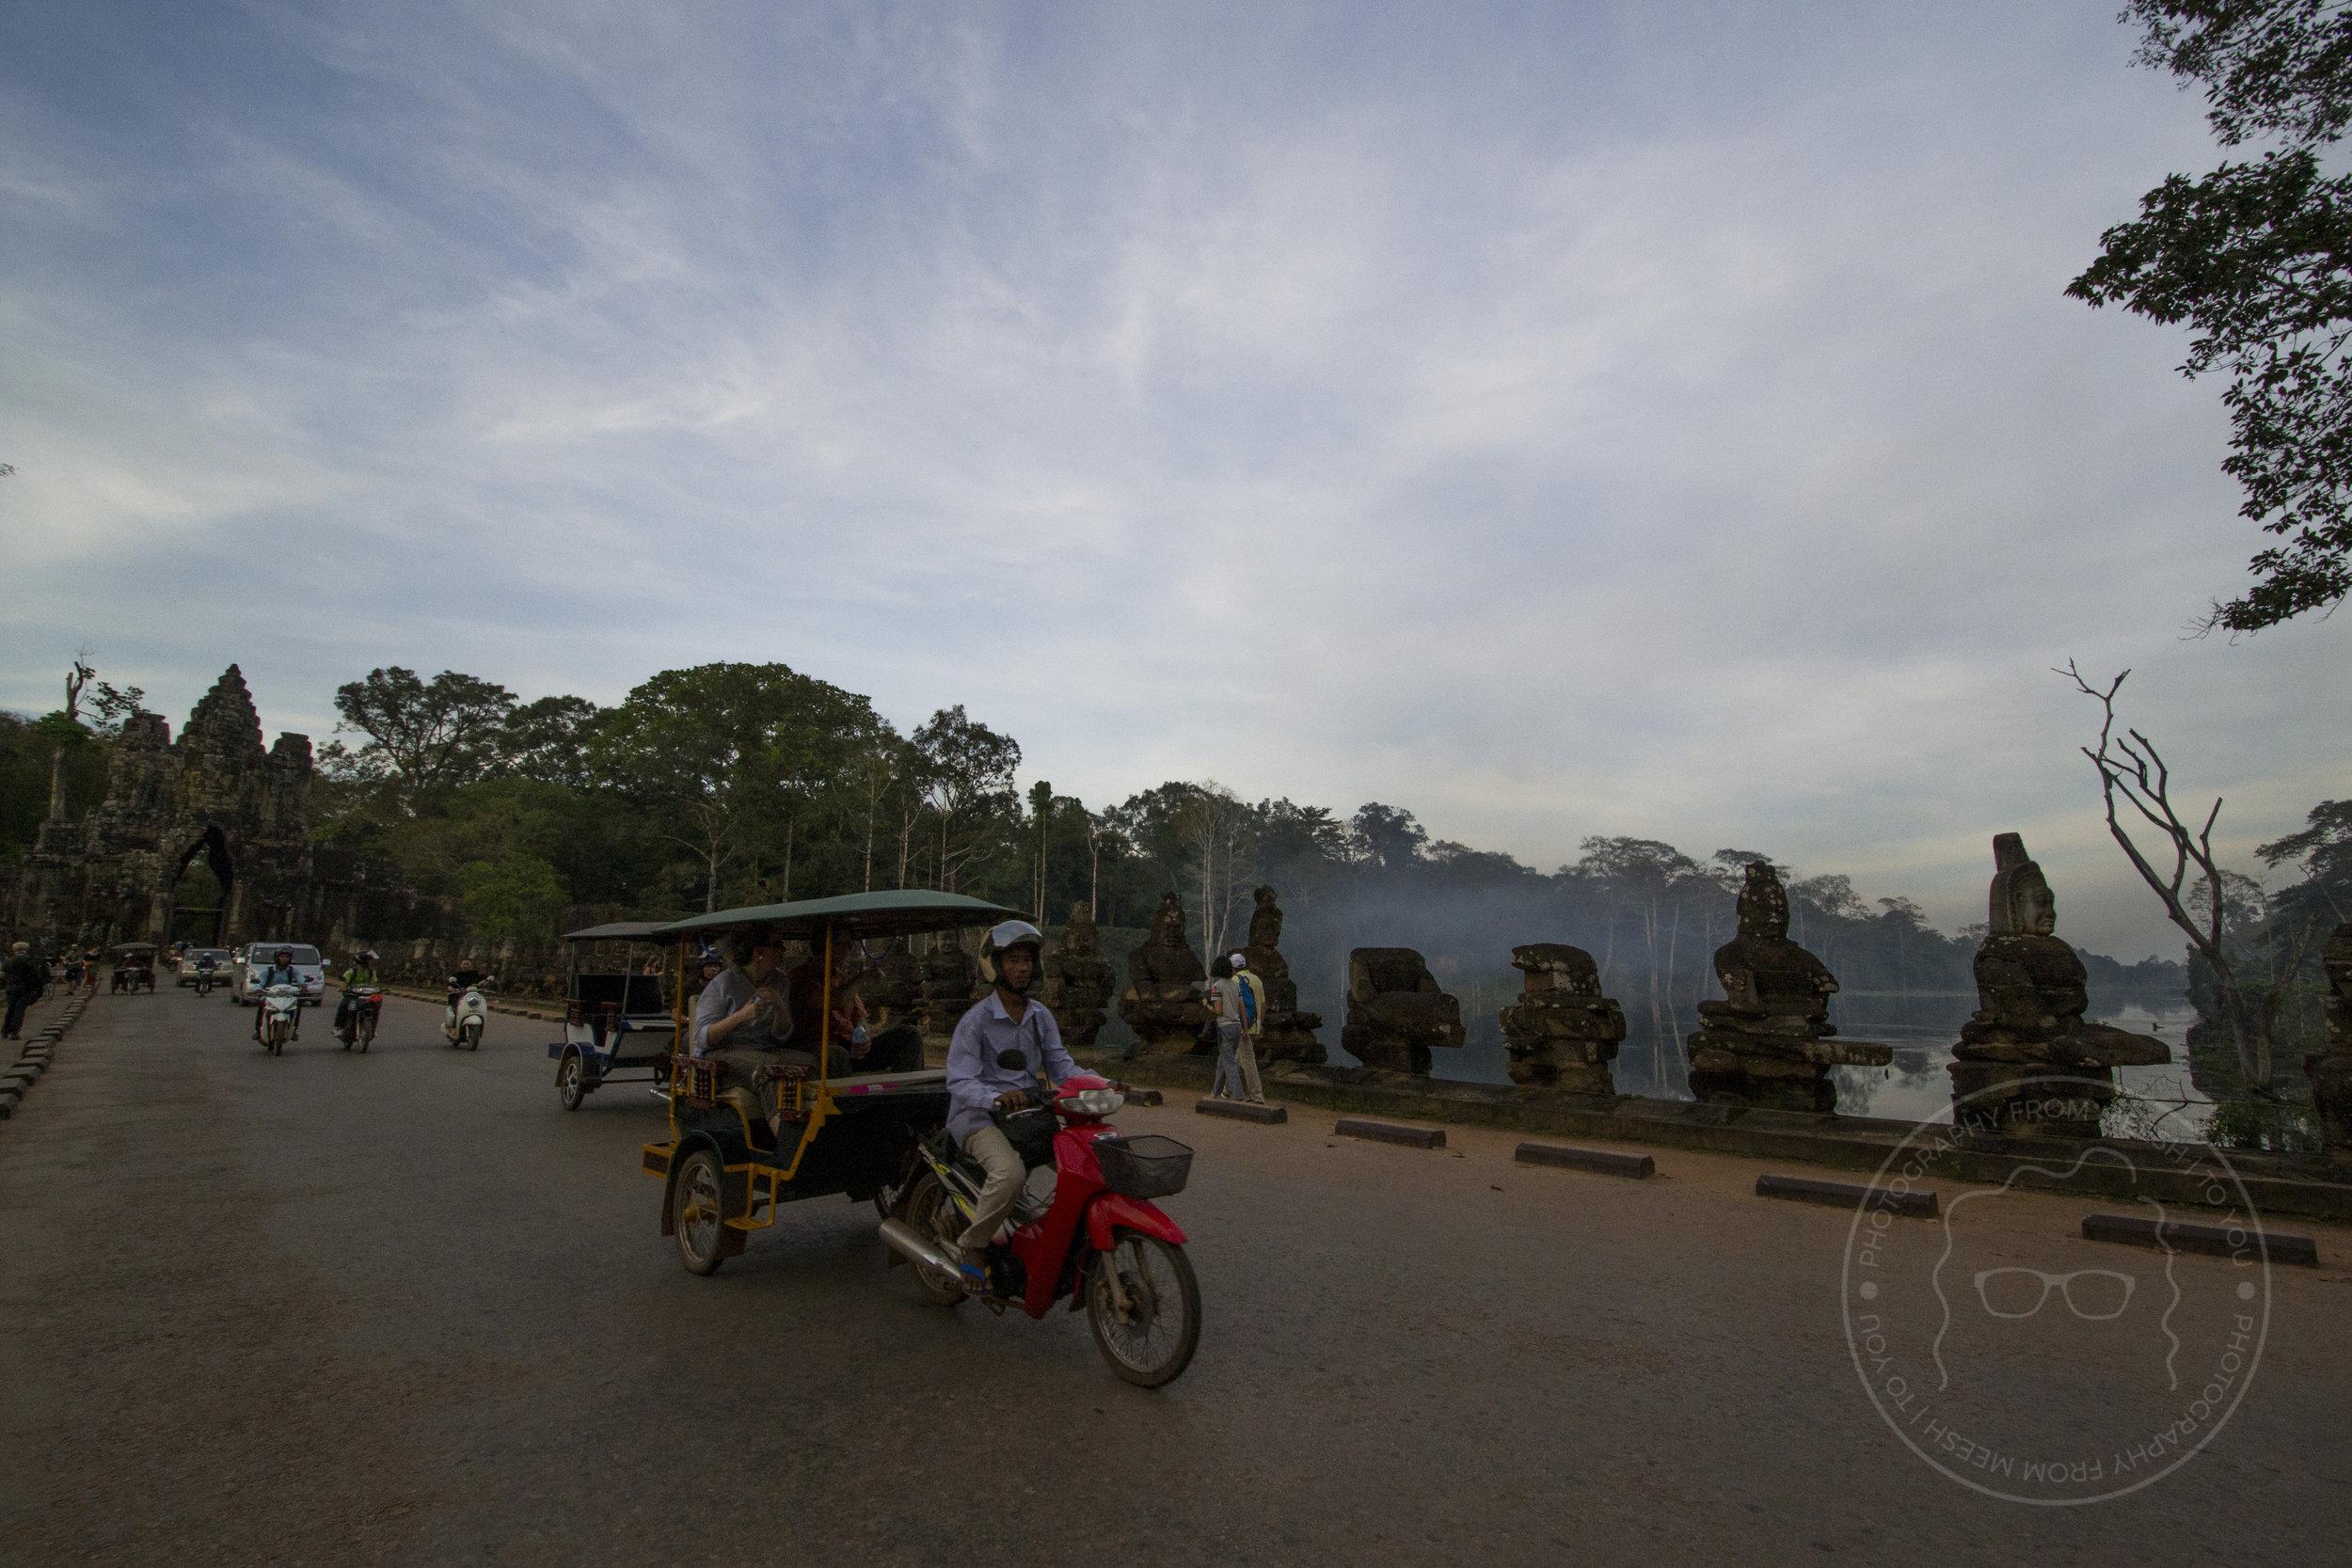 Angkor Wat | Siem Reap, Cambodia | 2017